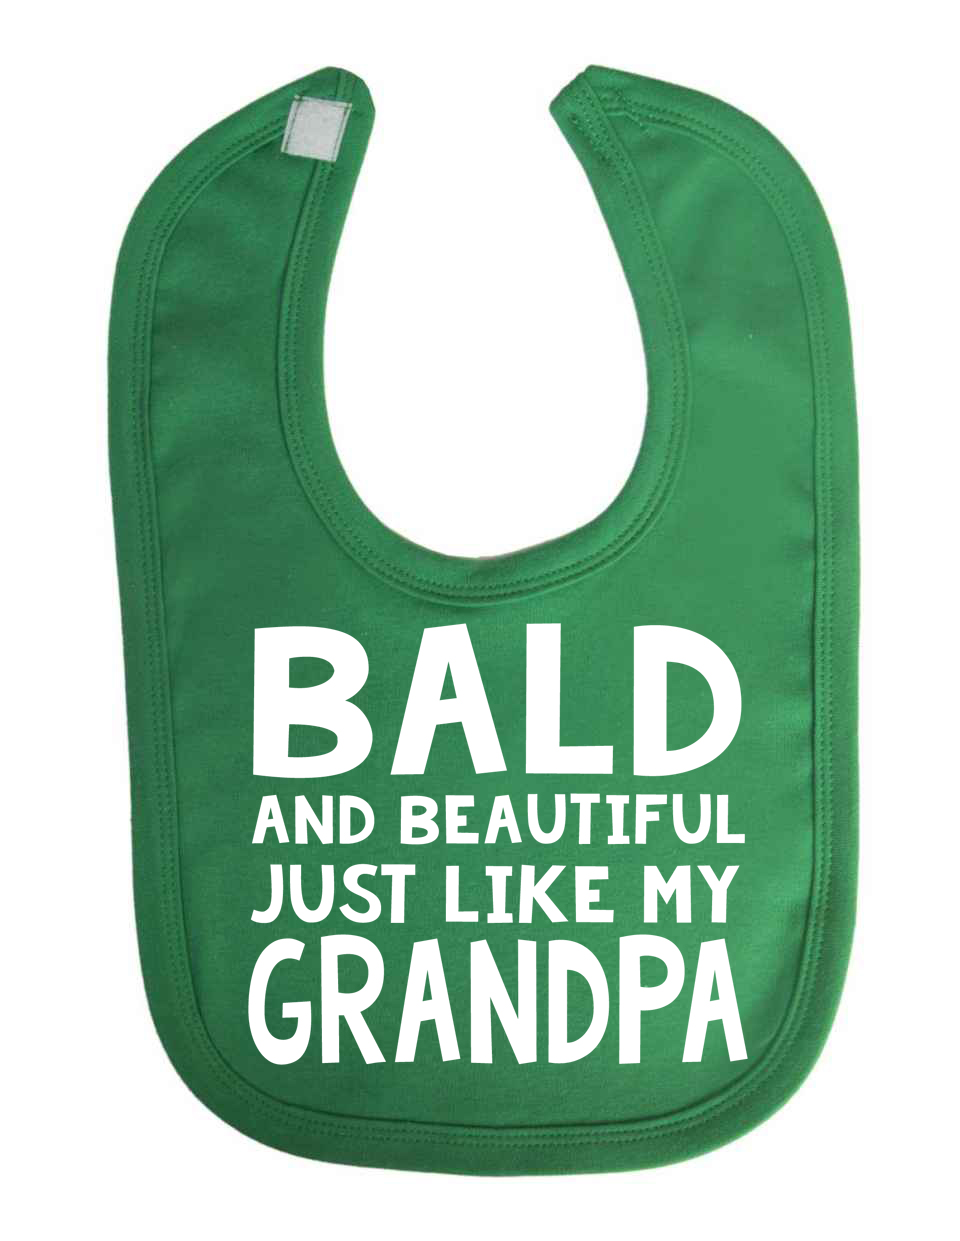 Bald and Beautiful Just Like My Grandpa Newborn Toddler Baby Bib